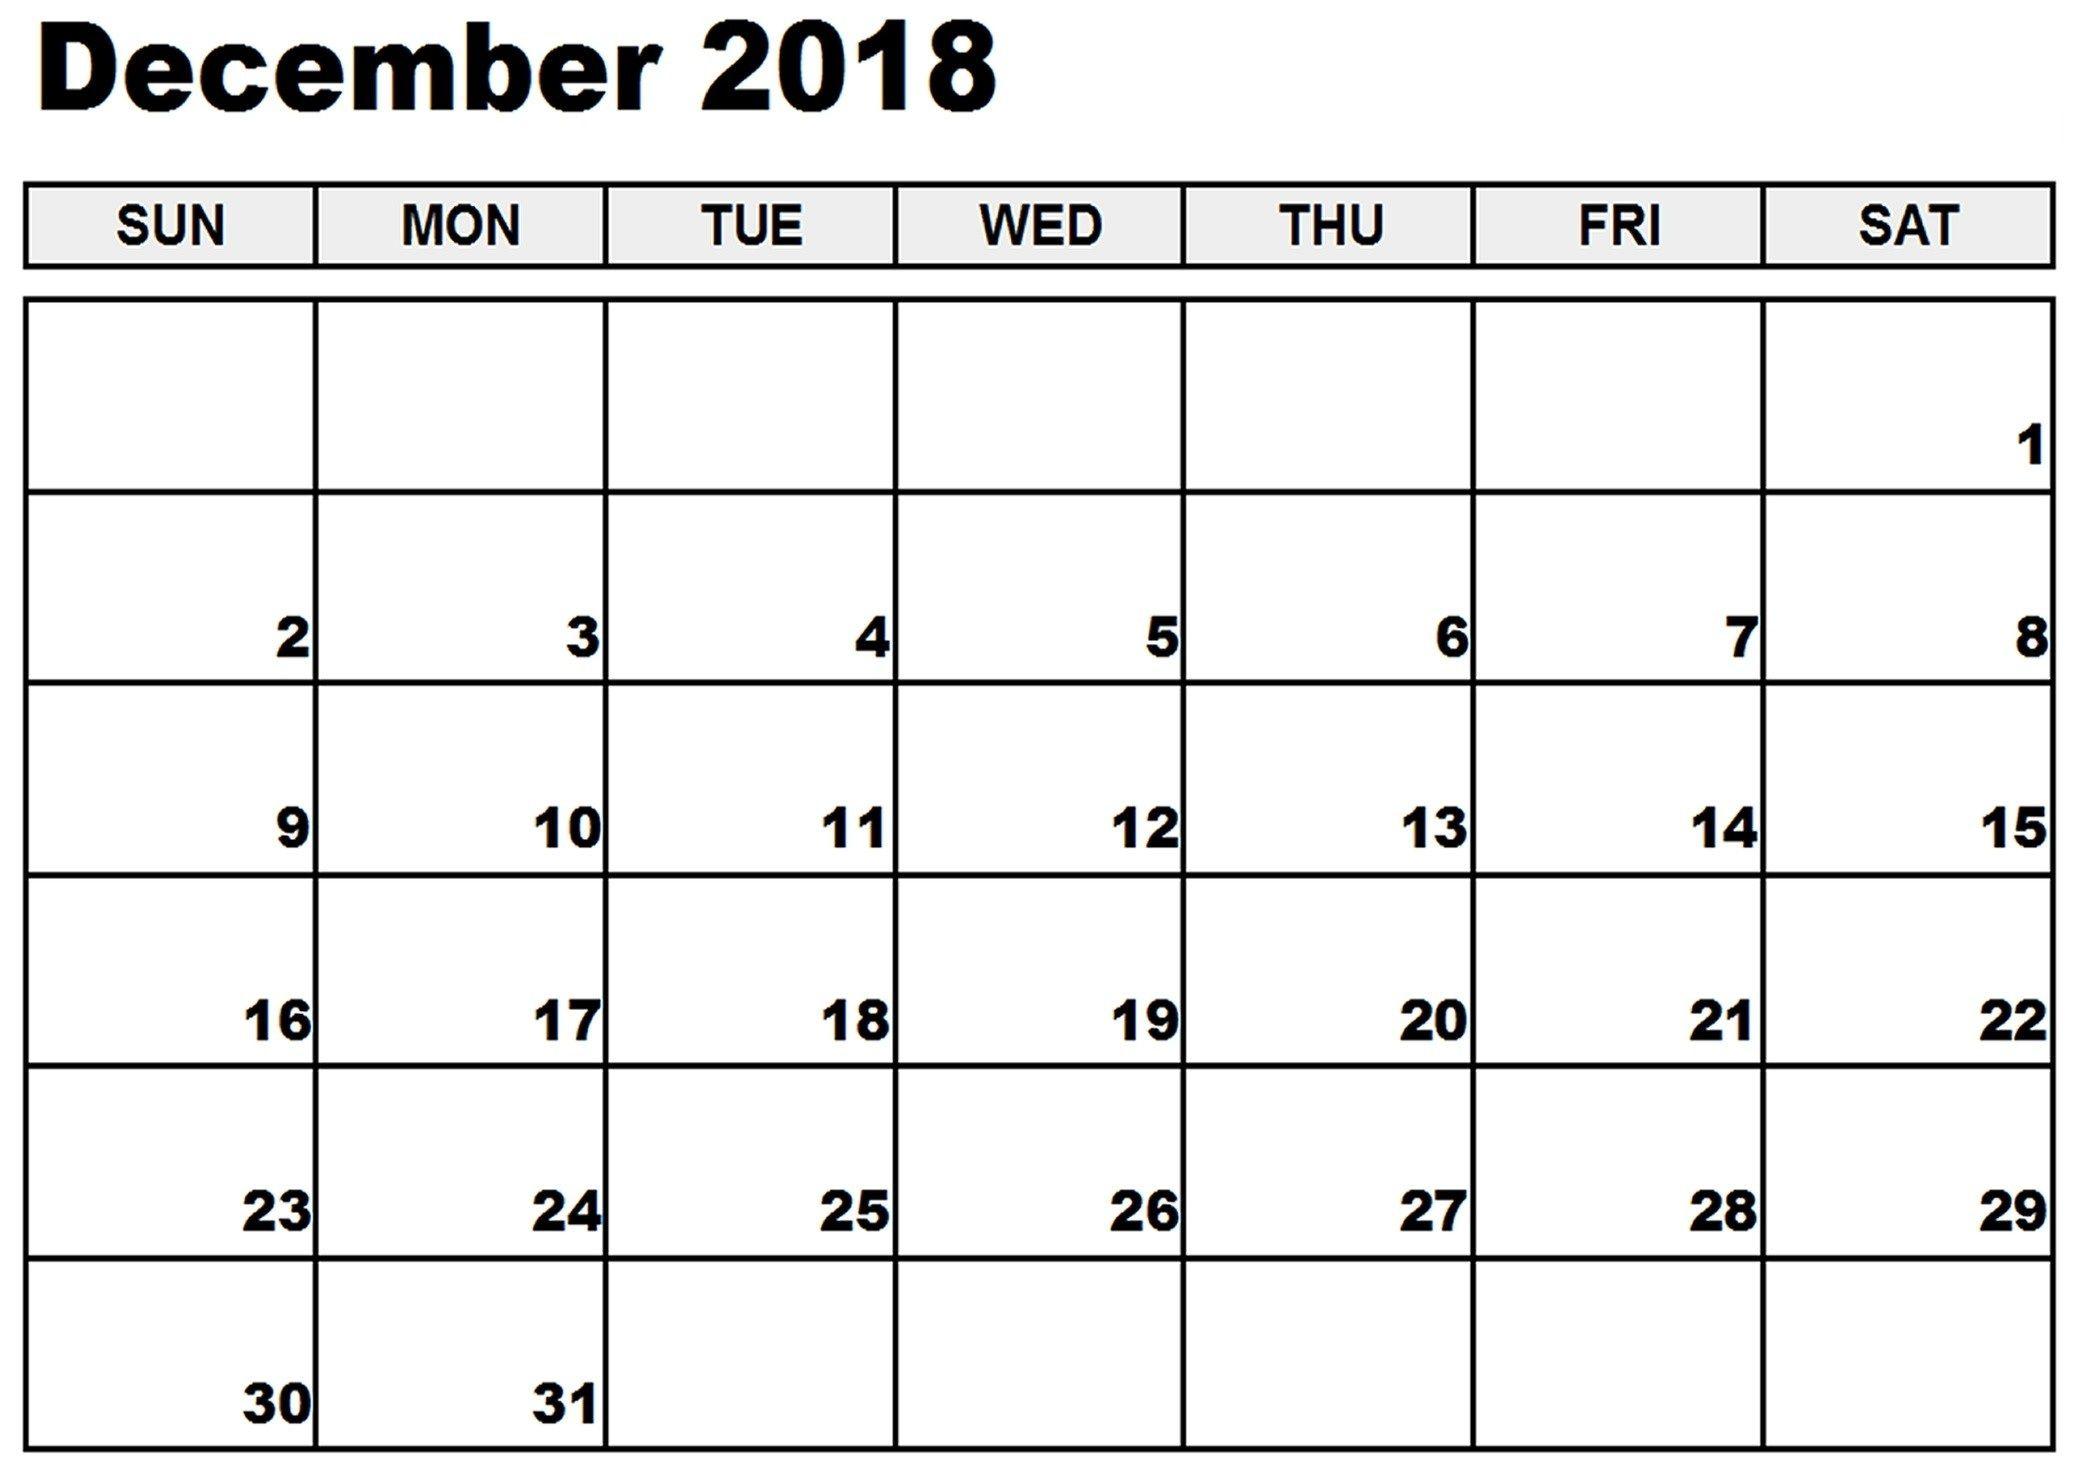 December 2018 Printable Calendar Notes To Do List Reminders inside Blank Printable Calendars December